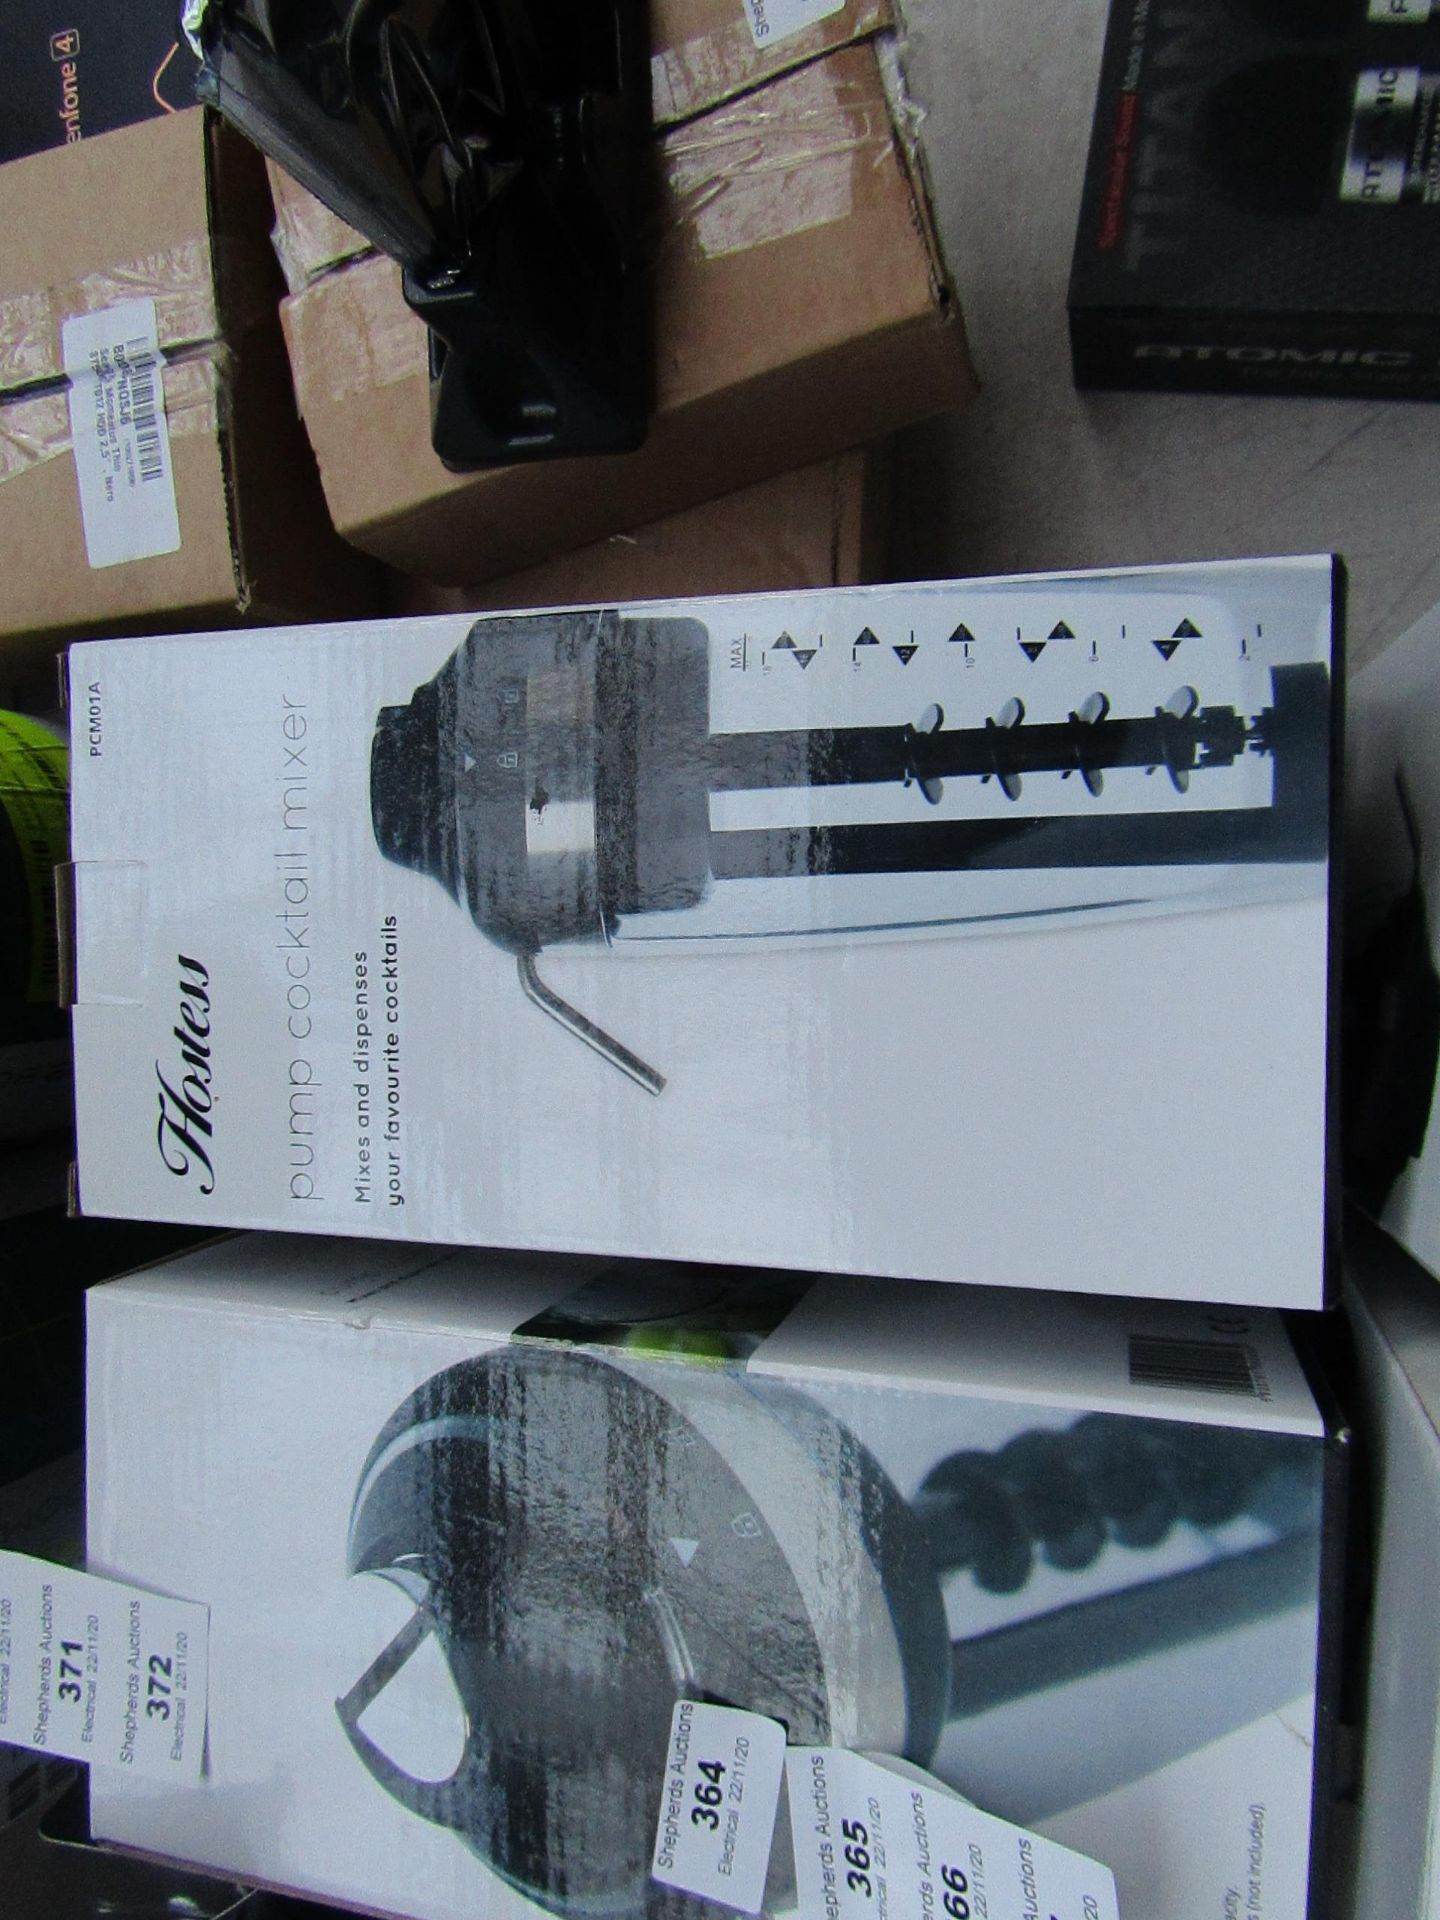 Hostess - Pump CockTail Mixer 500ML Capacity - unchecked & Boxed